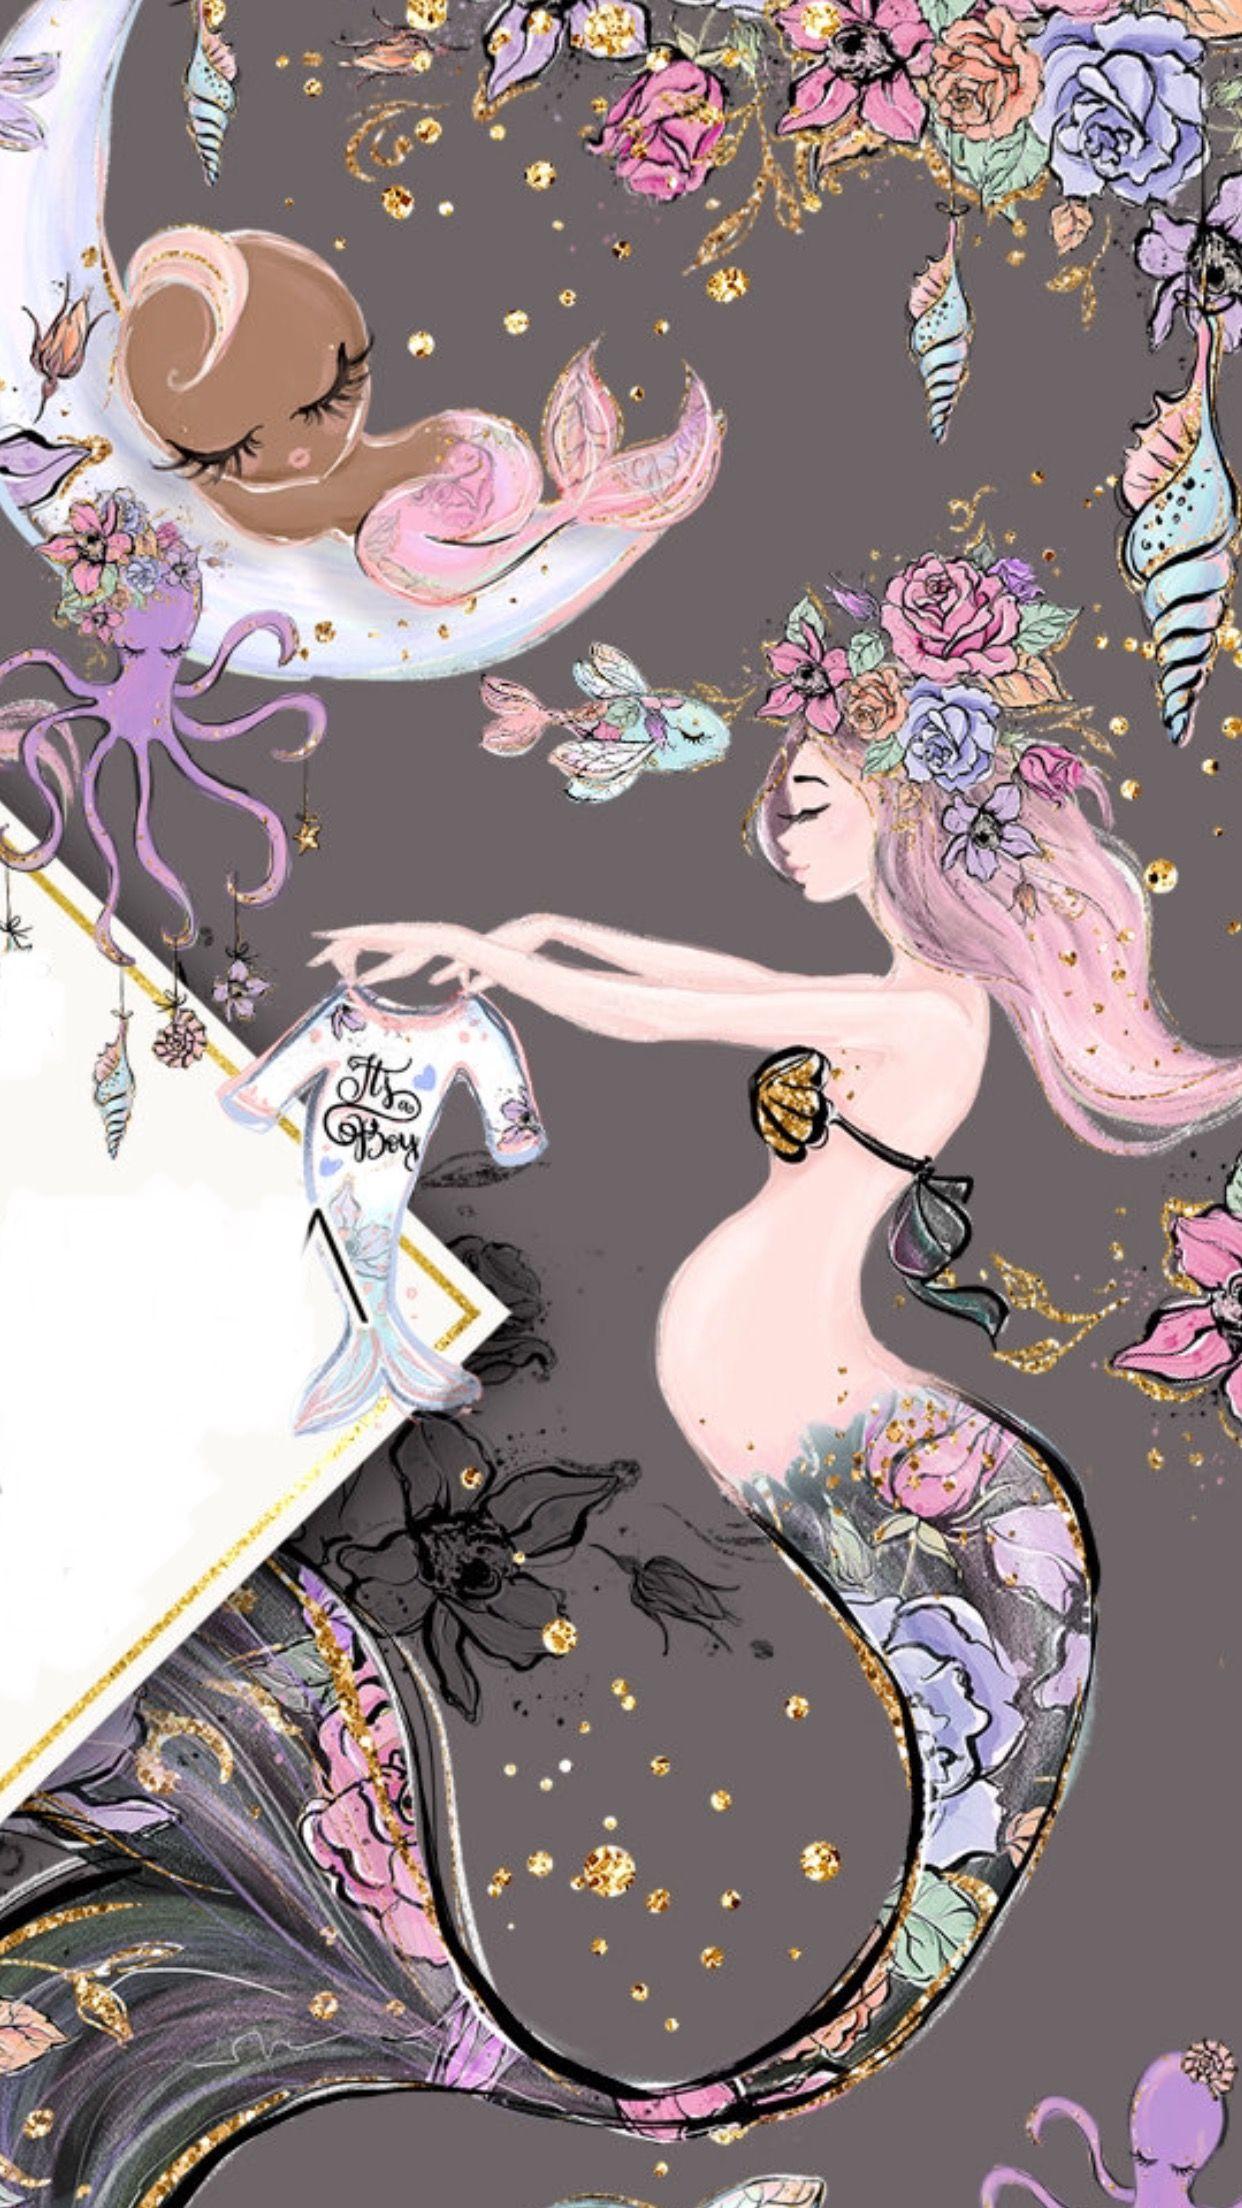 Pin by Ayse Erderi on Ahşapboya desen Illustration, Art